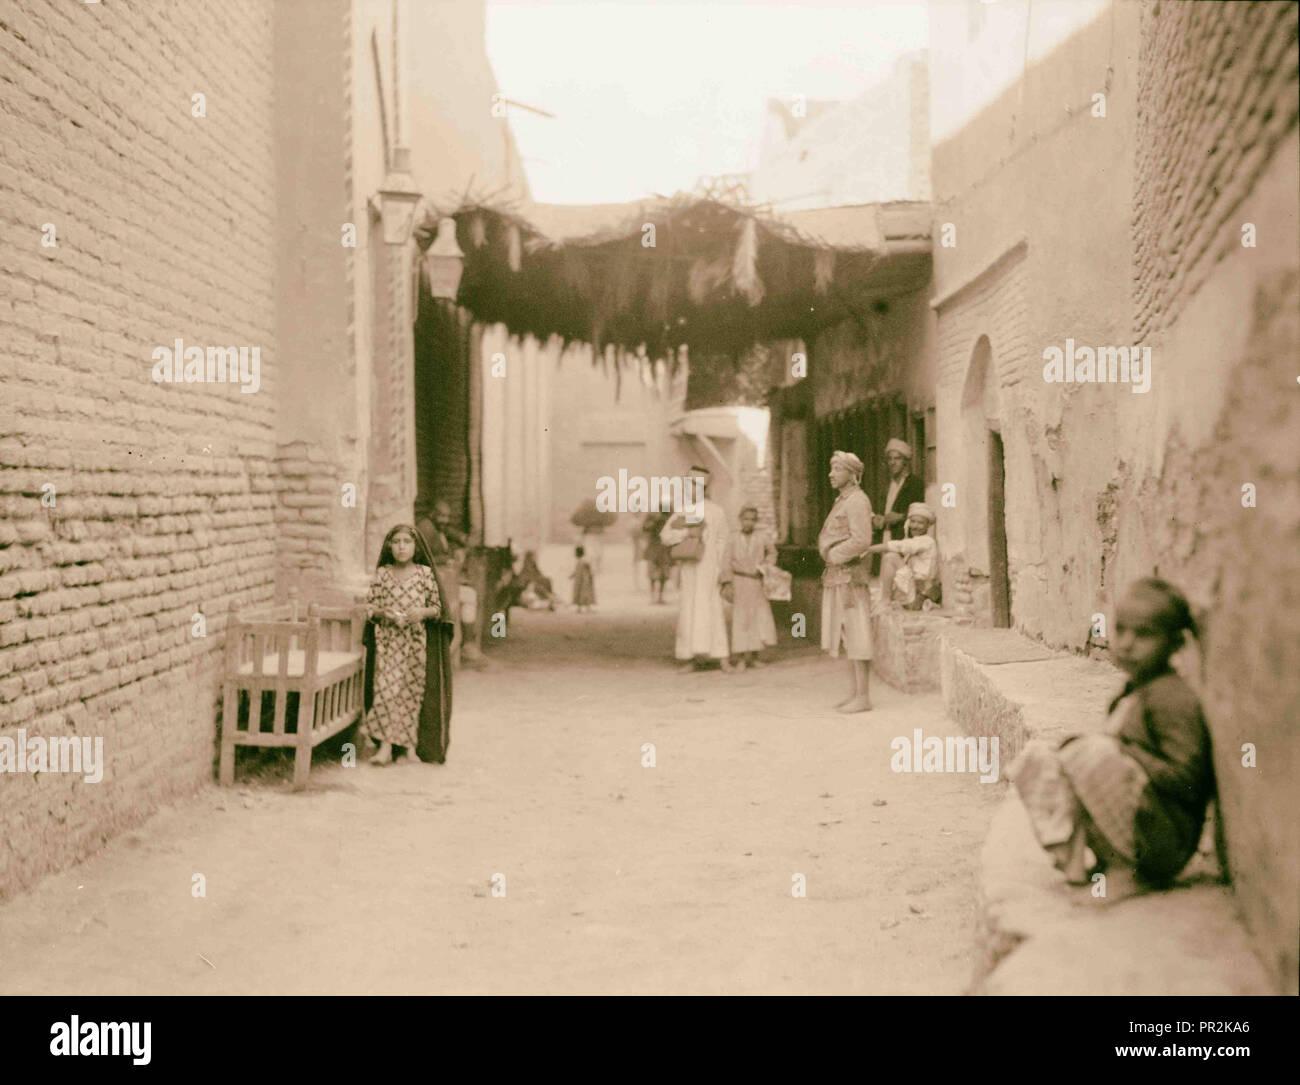 Iraq. Nejaf. First sacred city of the Shiite Moslems [i.e., Muslims]. A main street. 1932, Iraq, Najaf - Stock Image